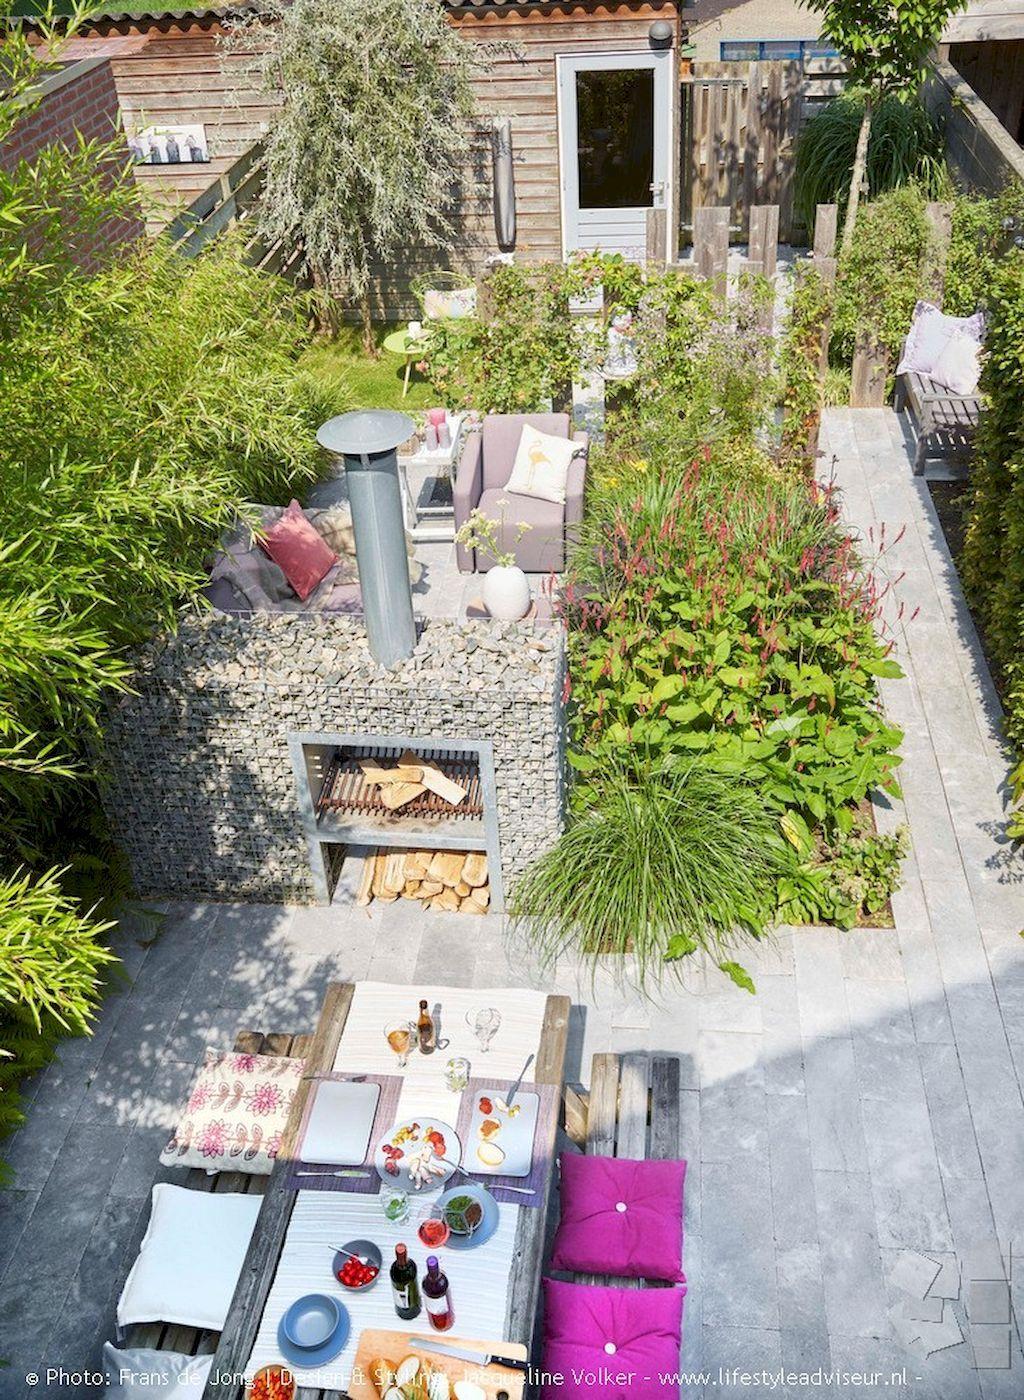 60 Low Maintenance Small Backyard Garden Ideas Backyard garden